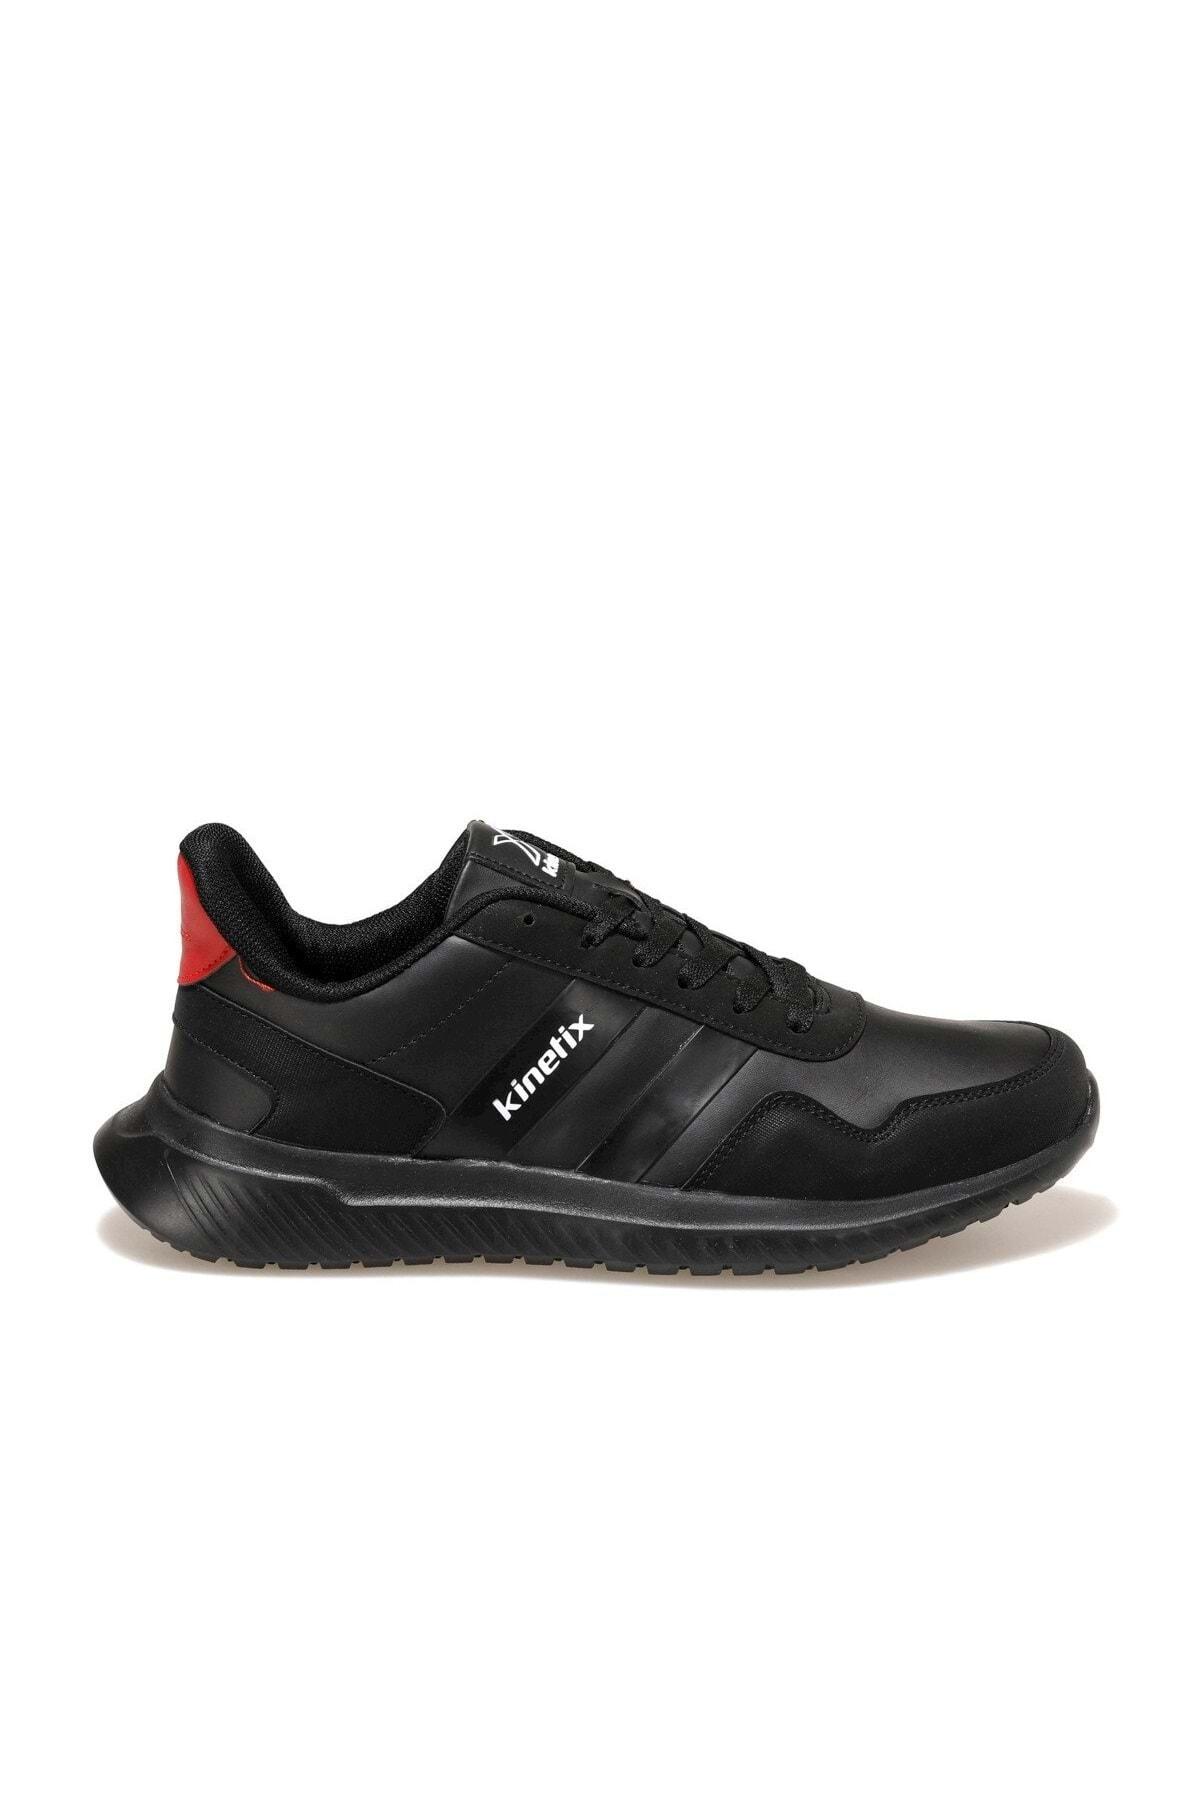 Kinetix ARINA PU M Siyah Erkek Çocuk Koşu Ayakkabısı 100536602 2